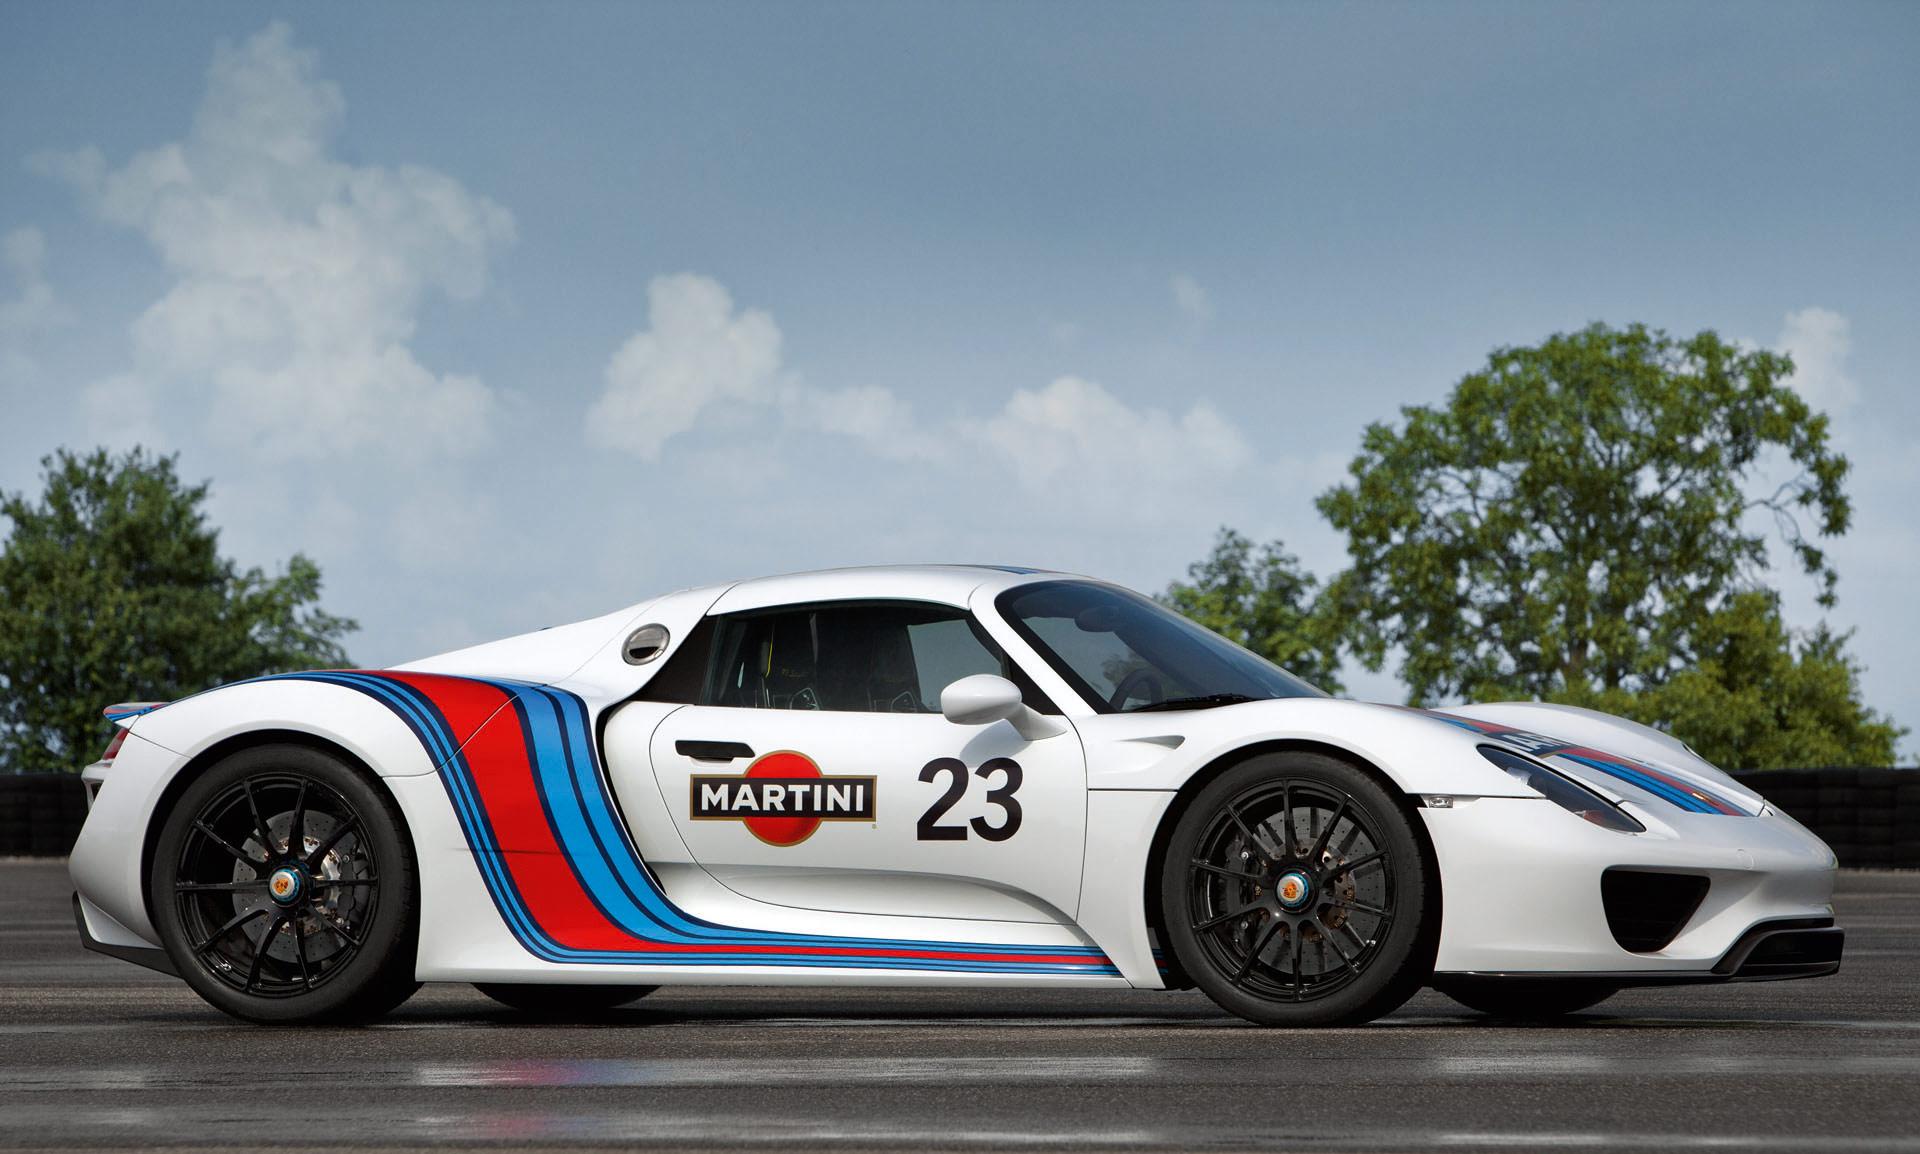 Porsche martini racing wallpaper